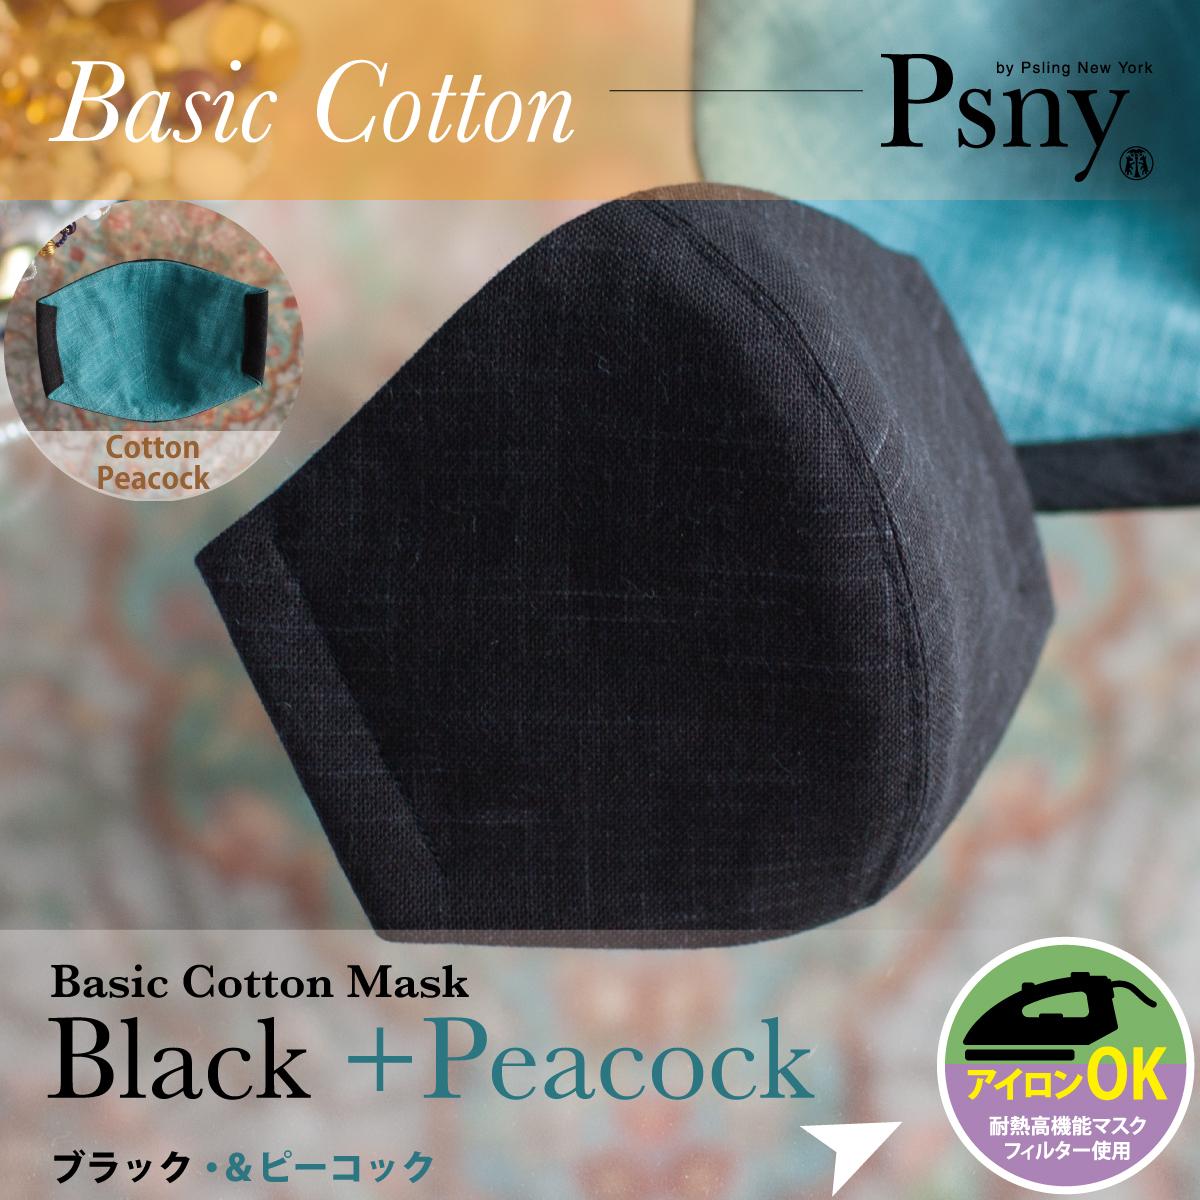 PSNY ベーシックコットン・ブラック(&ピーコック) 花粉 黄砂 洗えるフィルター入り 立体 マスク 大人用 CB5